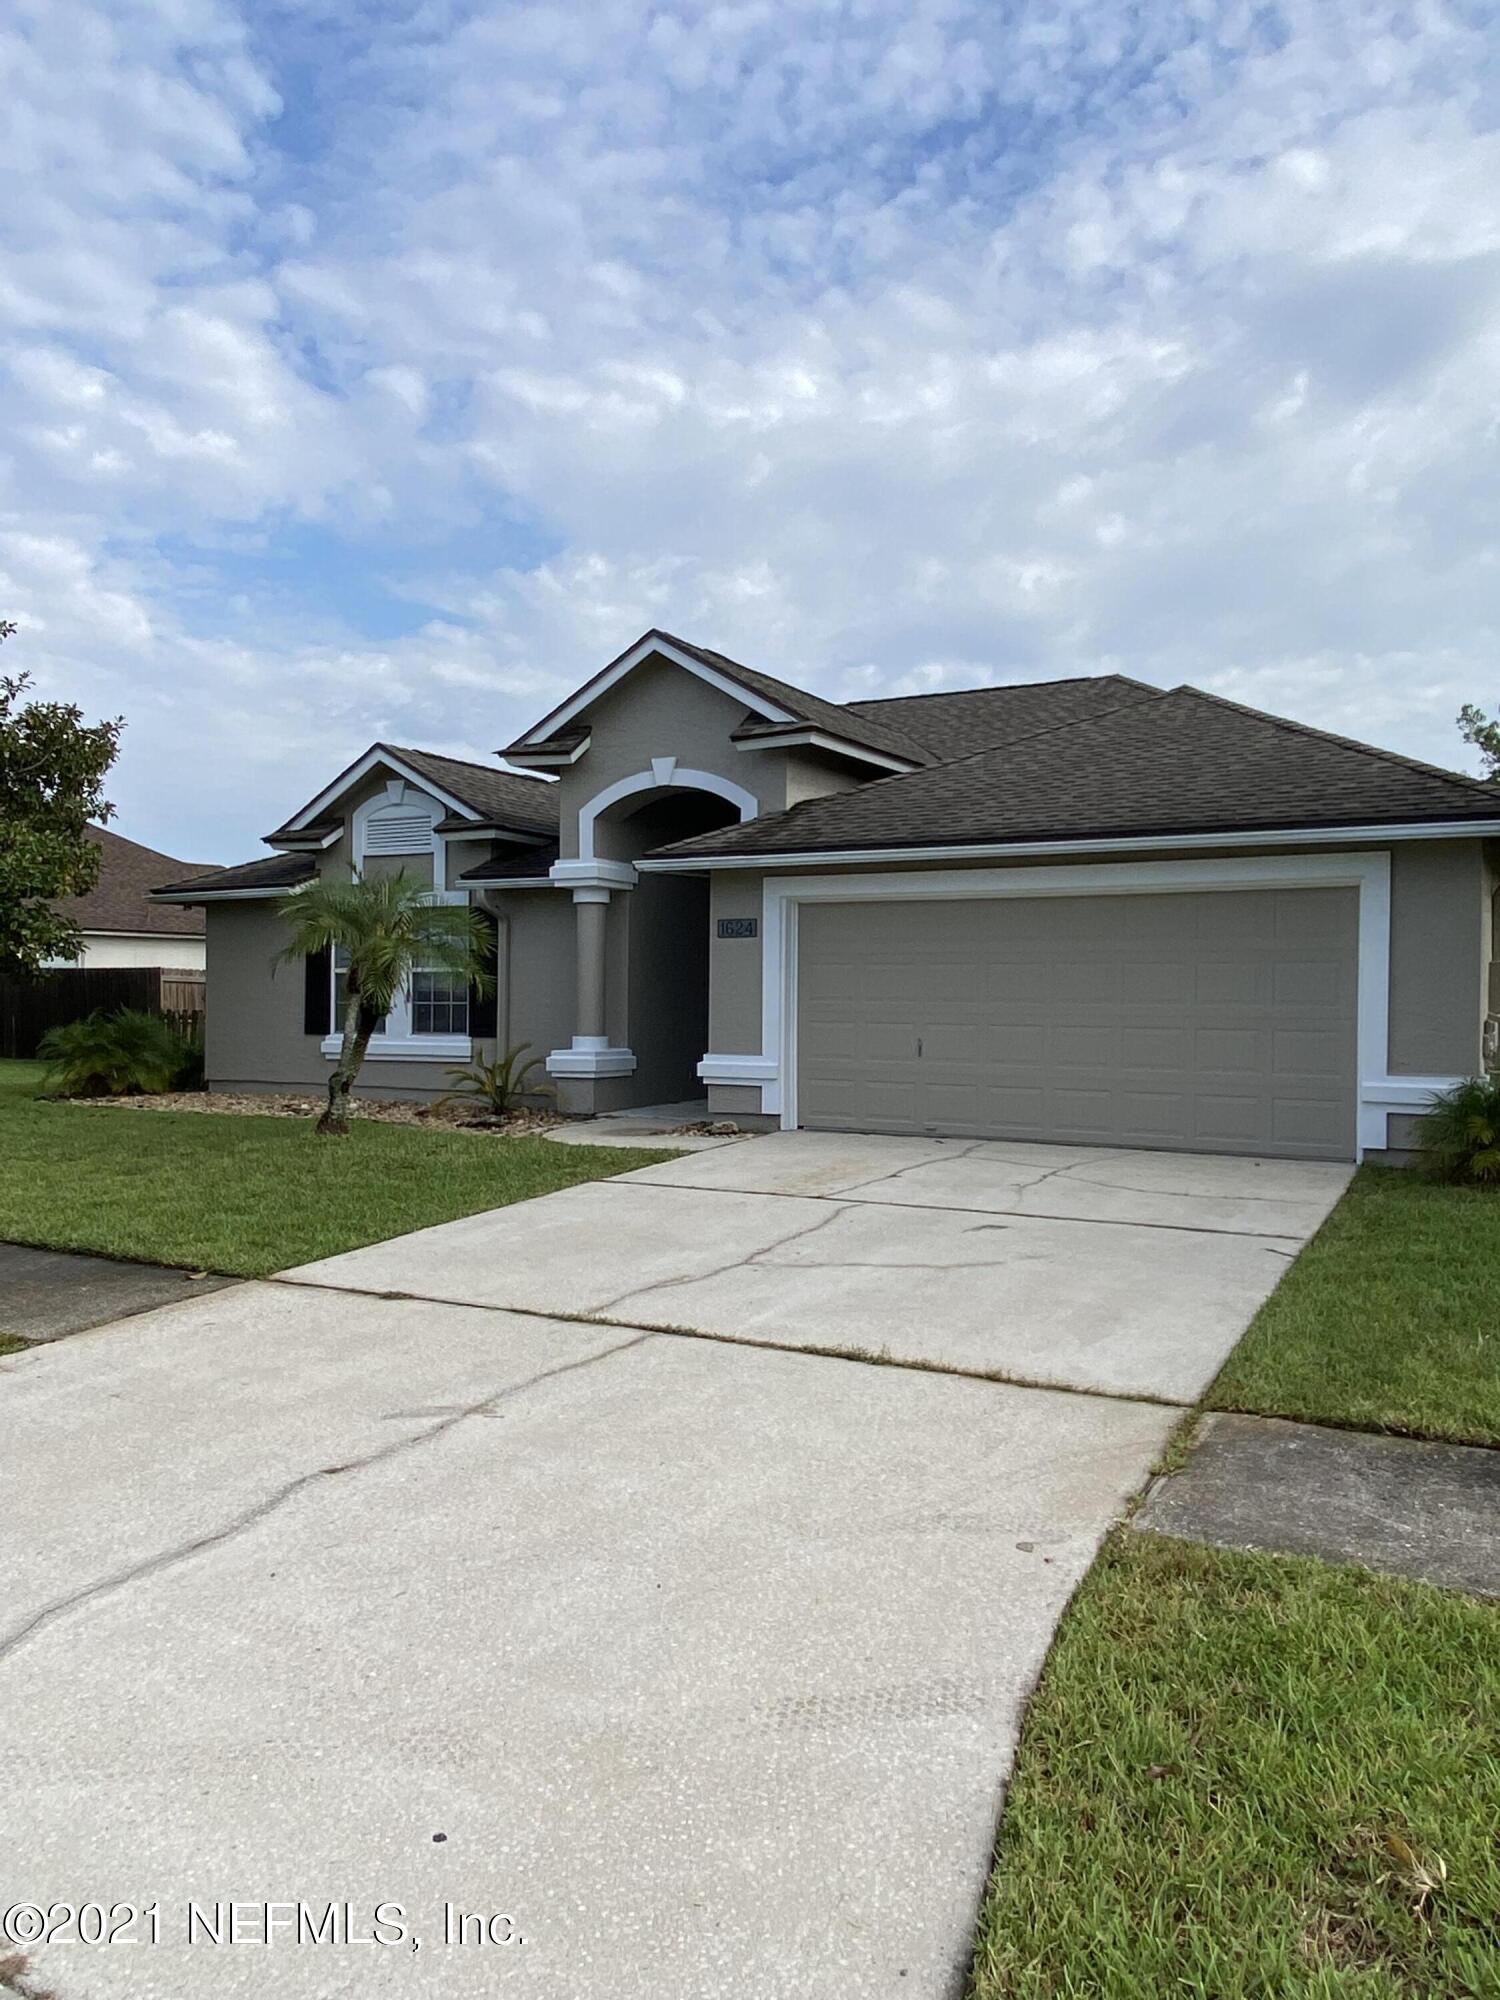 1624 HAMPTON, FLEMING ISLAND, FLORIDA 32003, 3 Bedrooms Bedrooms, ,2 BathroomsBathrooms,Residential,For sale,HAMPTON,1120972